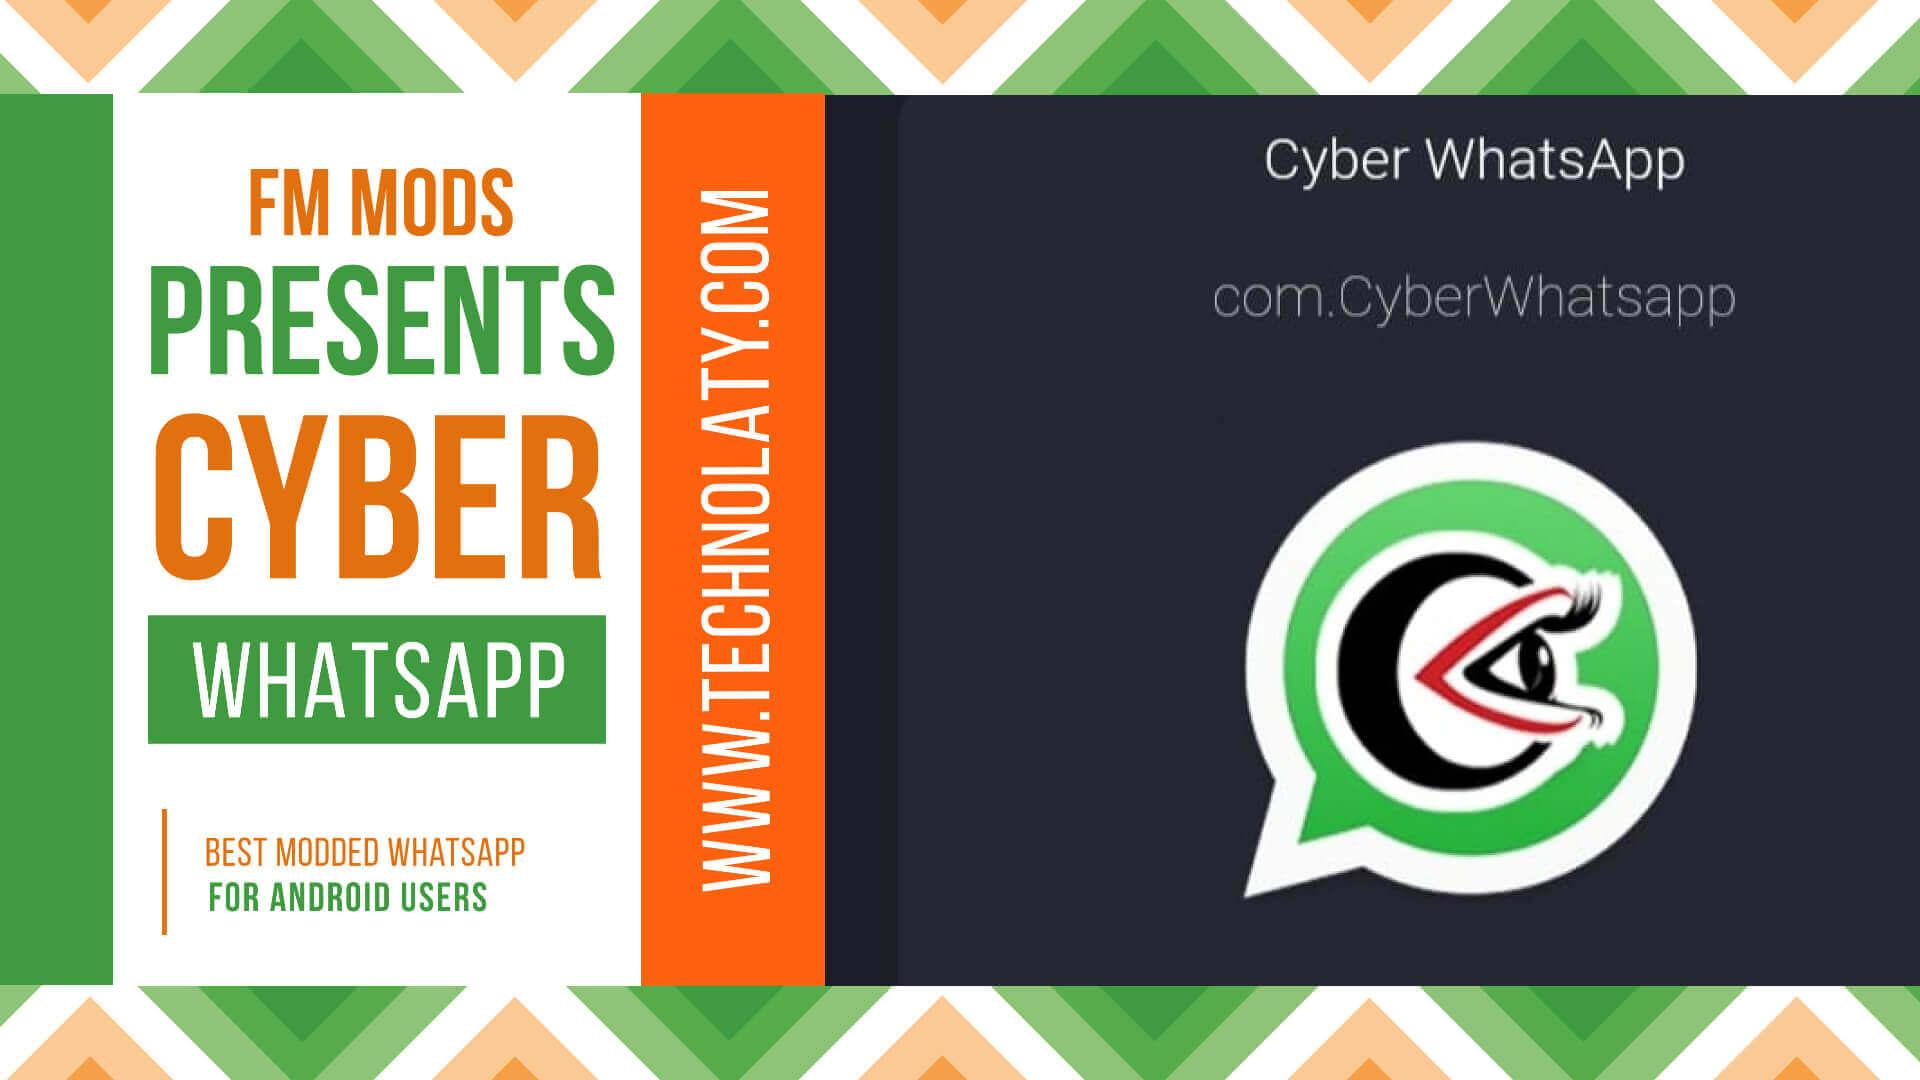 Download Cyber WhatsApp APK